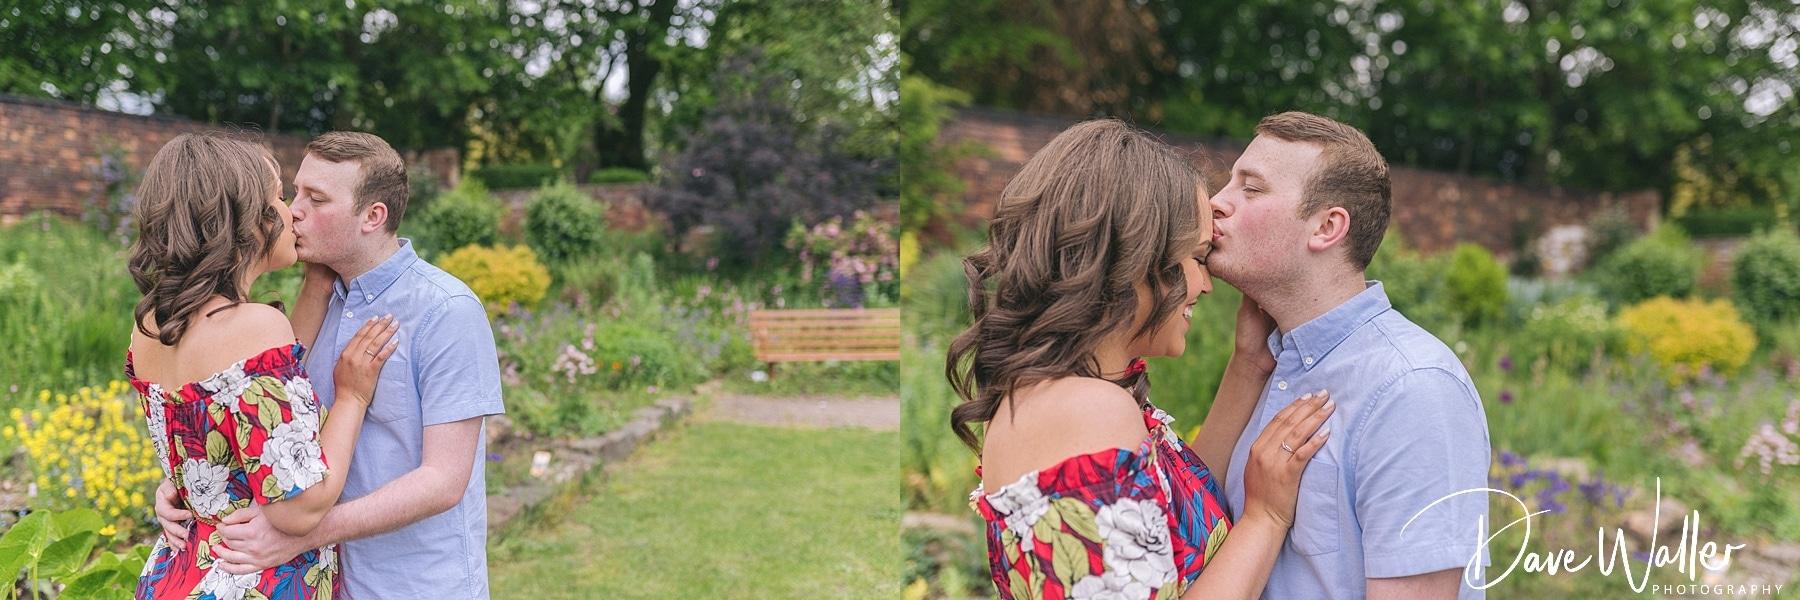 00019_WEST_YORKSHIRE_WEDDING_PHOTOGRAPHER_LEEDS_WEDDING_PHOTOGRAPHER_.jpg